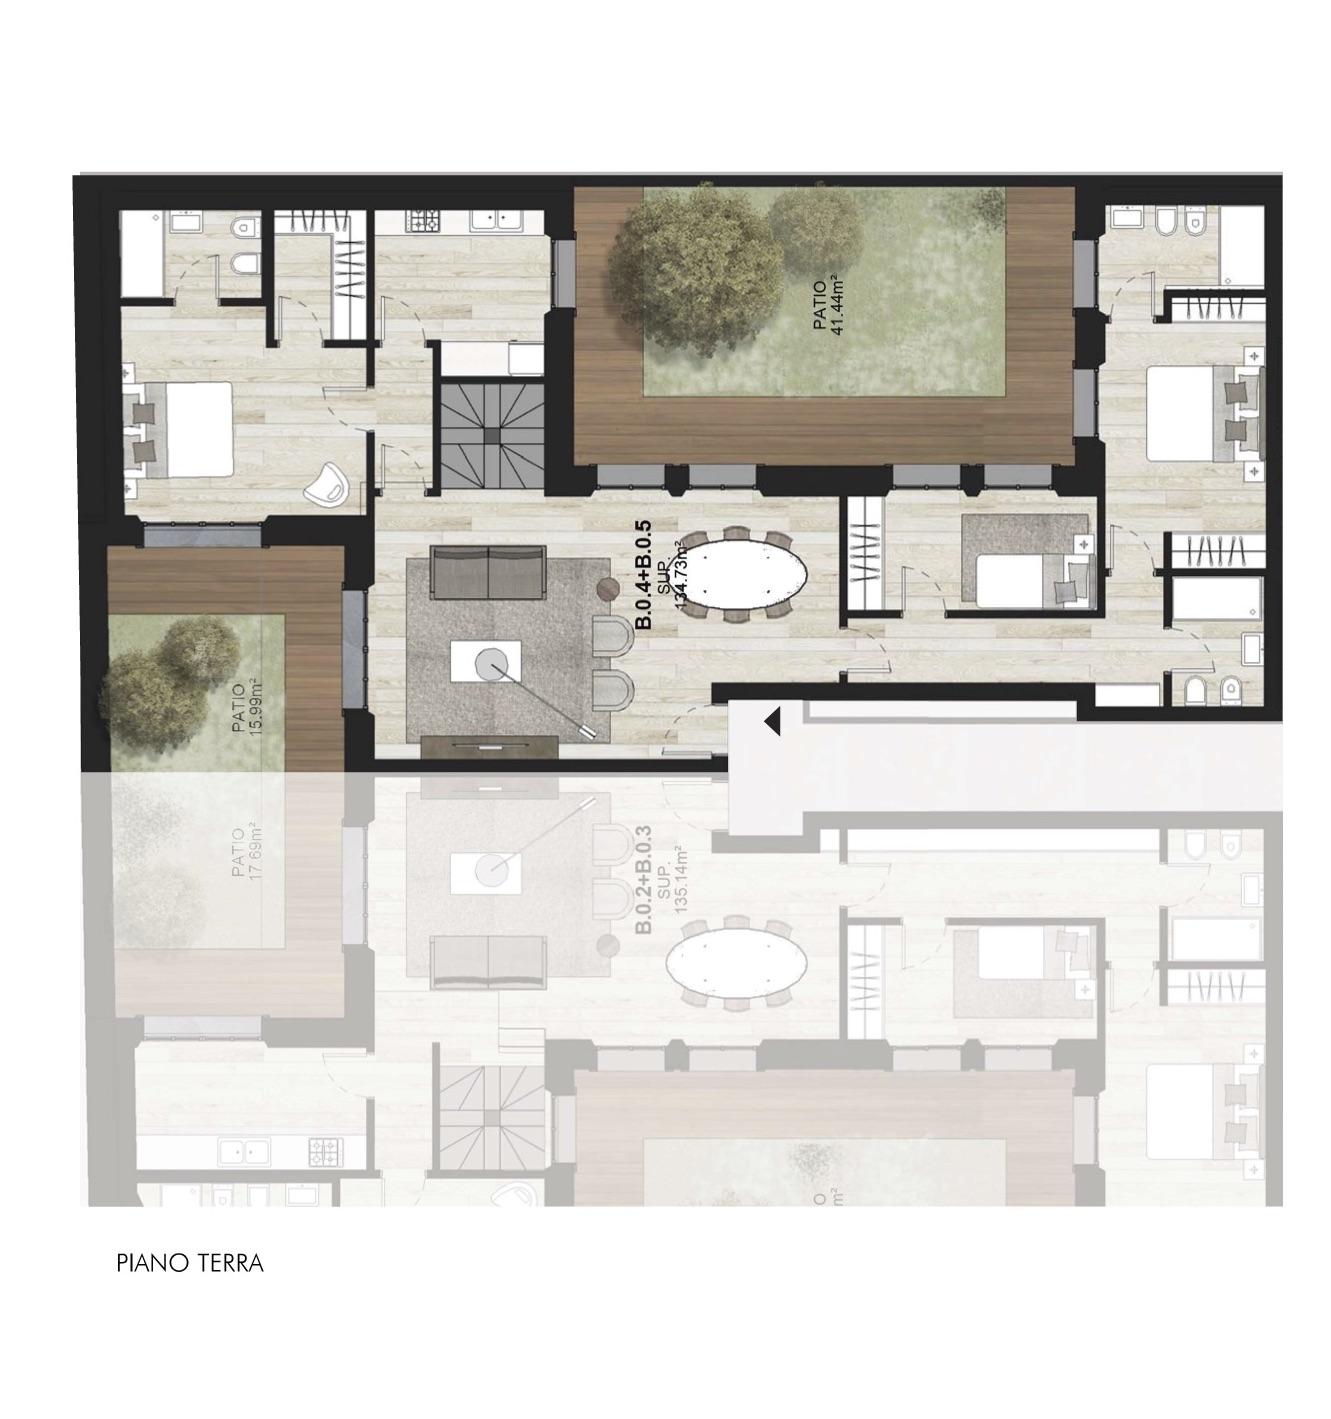 B0.4 + B0.5 Appartamenti con giardino Porta Romana Milano - Vasari 3